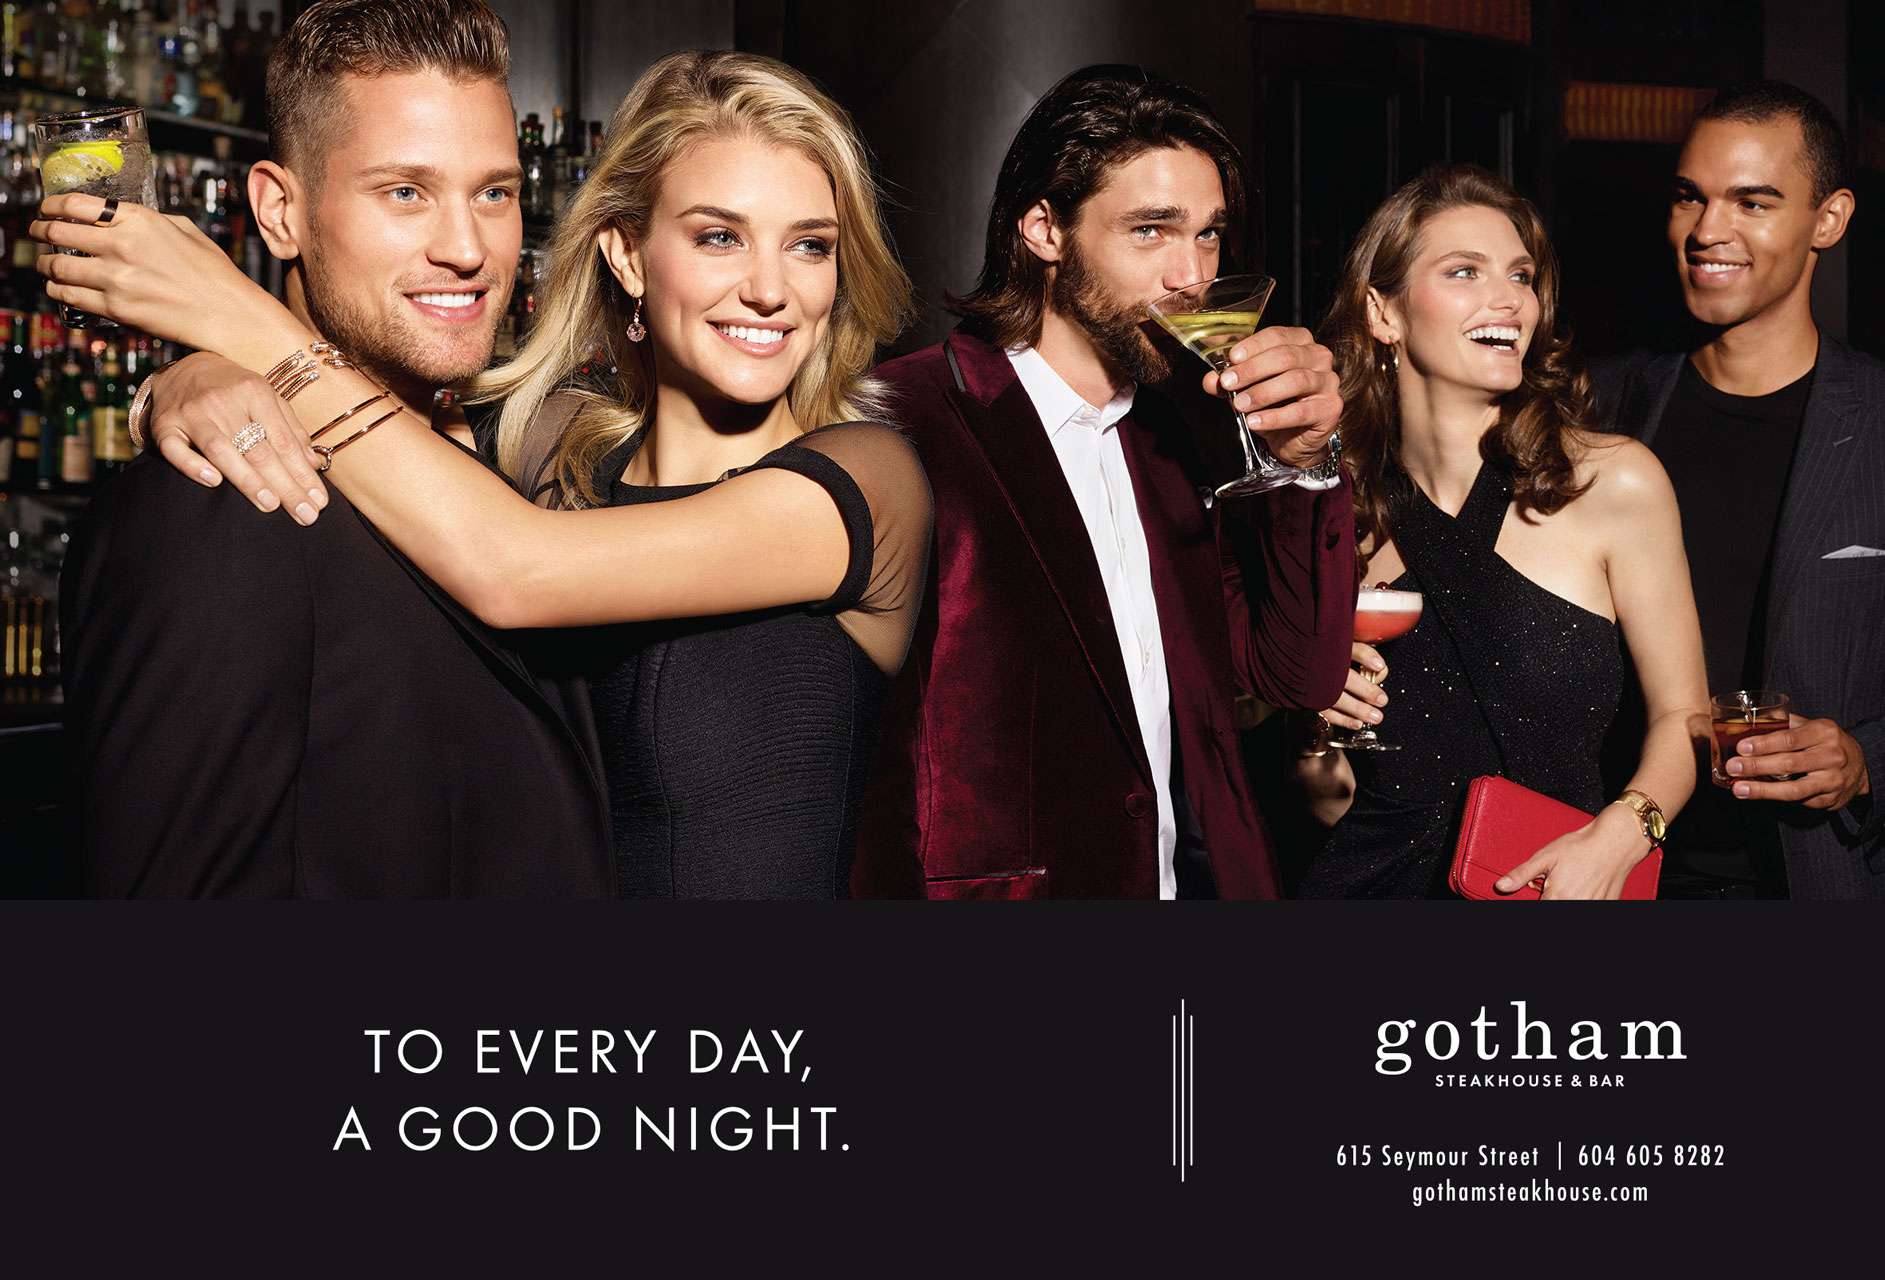 David Fierro's lifestyle image for Gotham Steakhouse & Bar